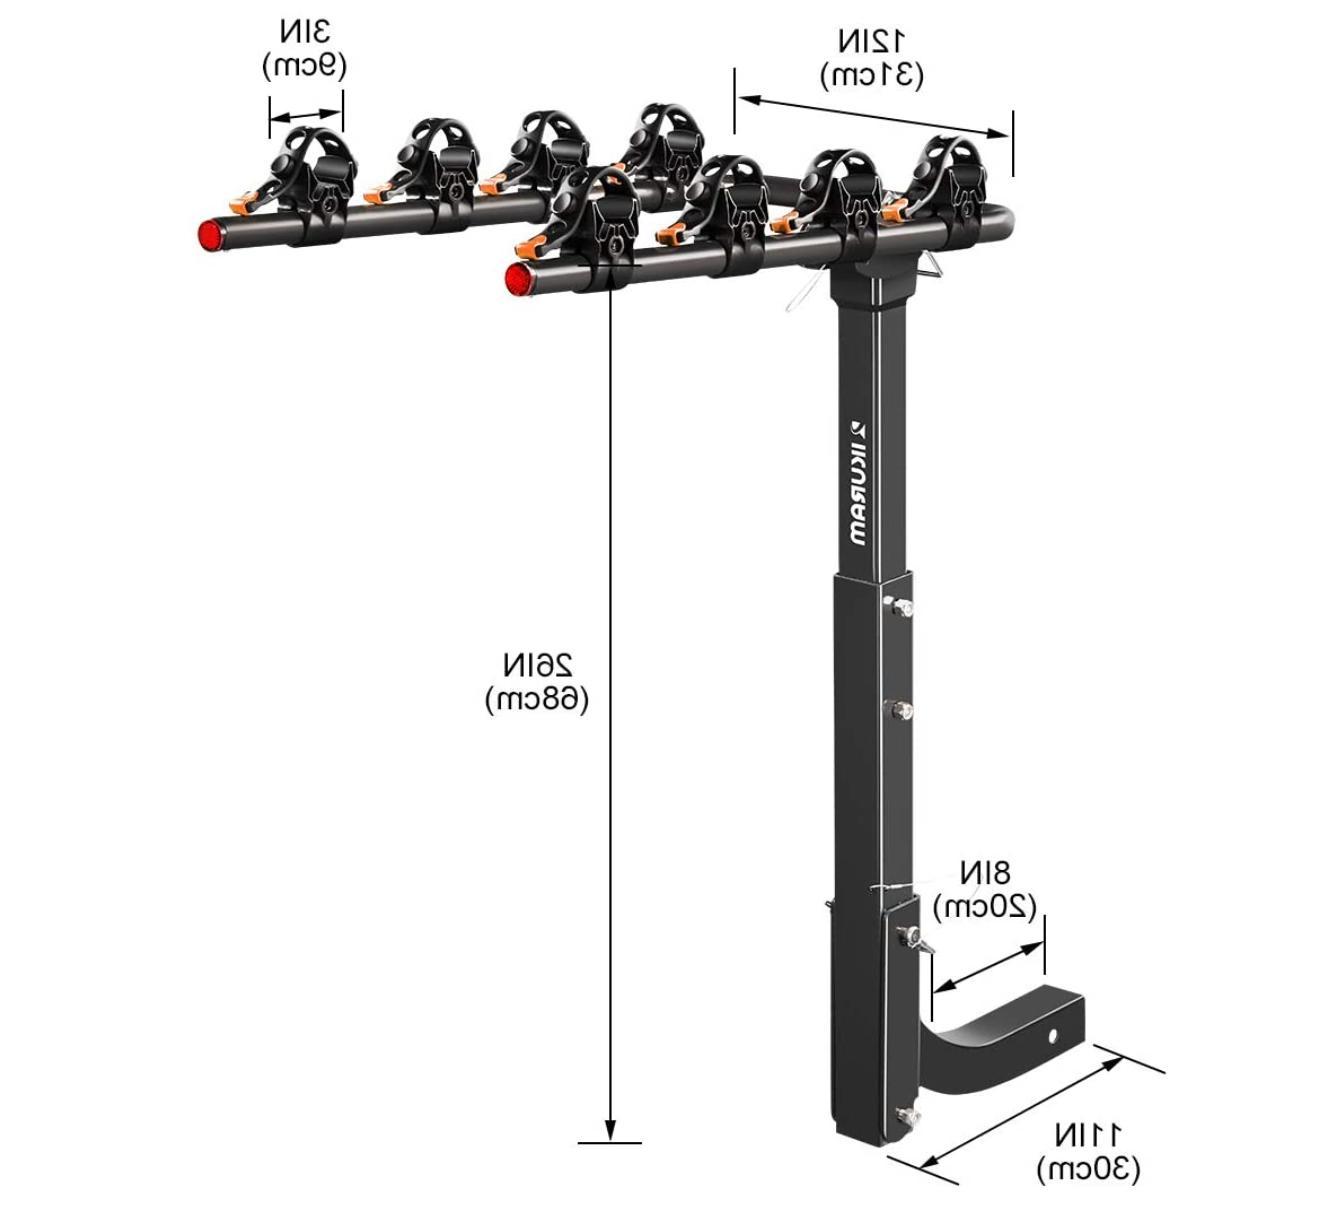 4 Bike Rack Mount SUV Trailer Carrier